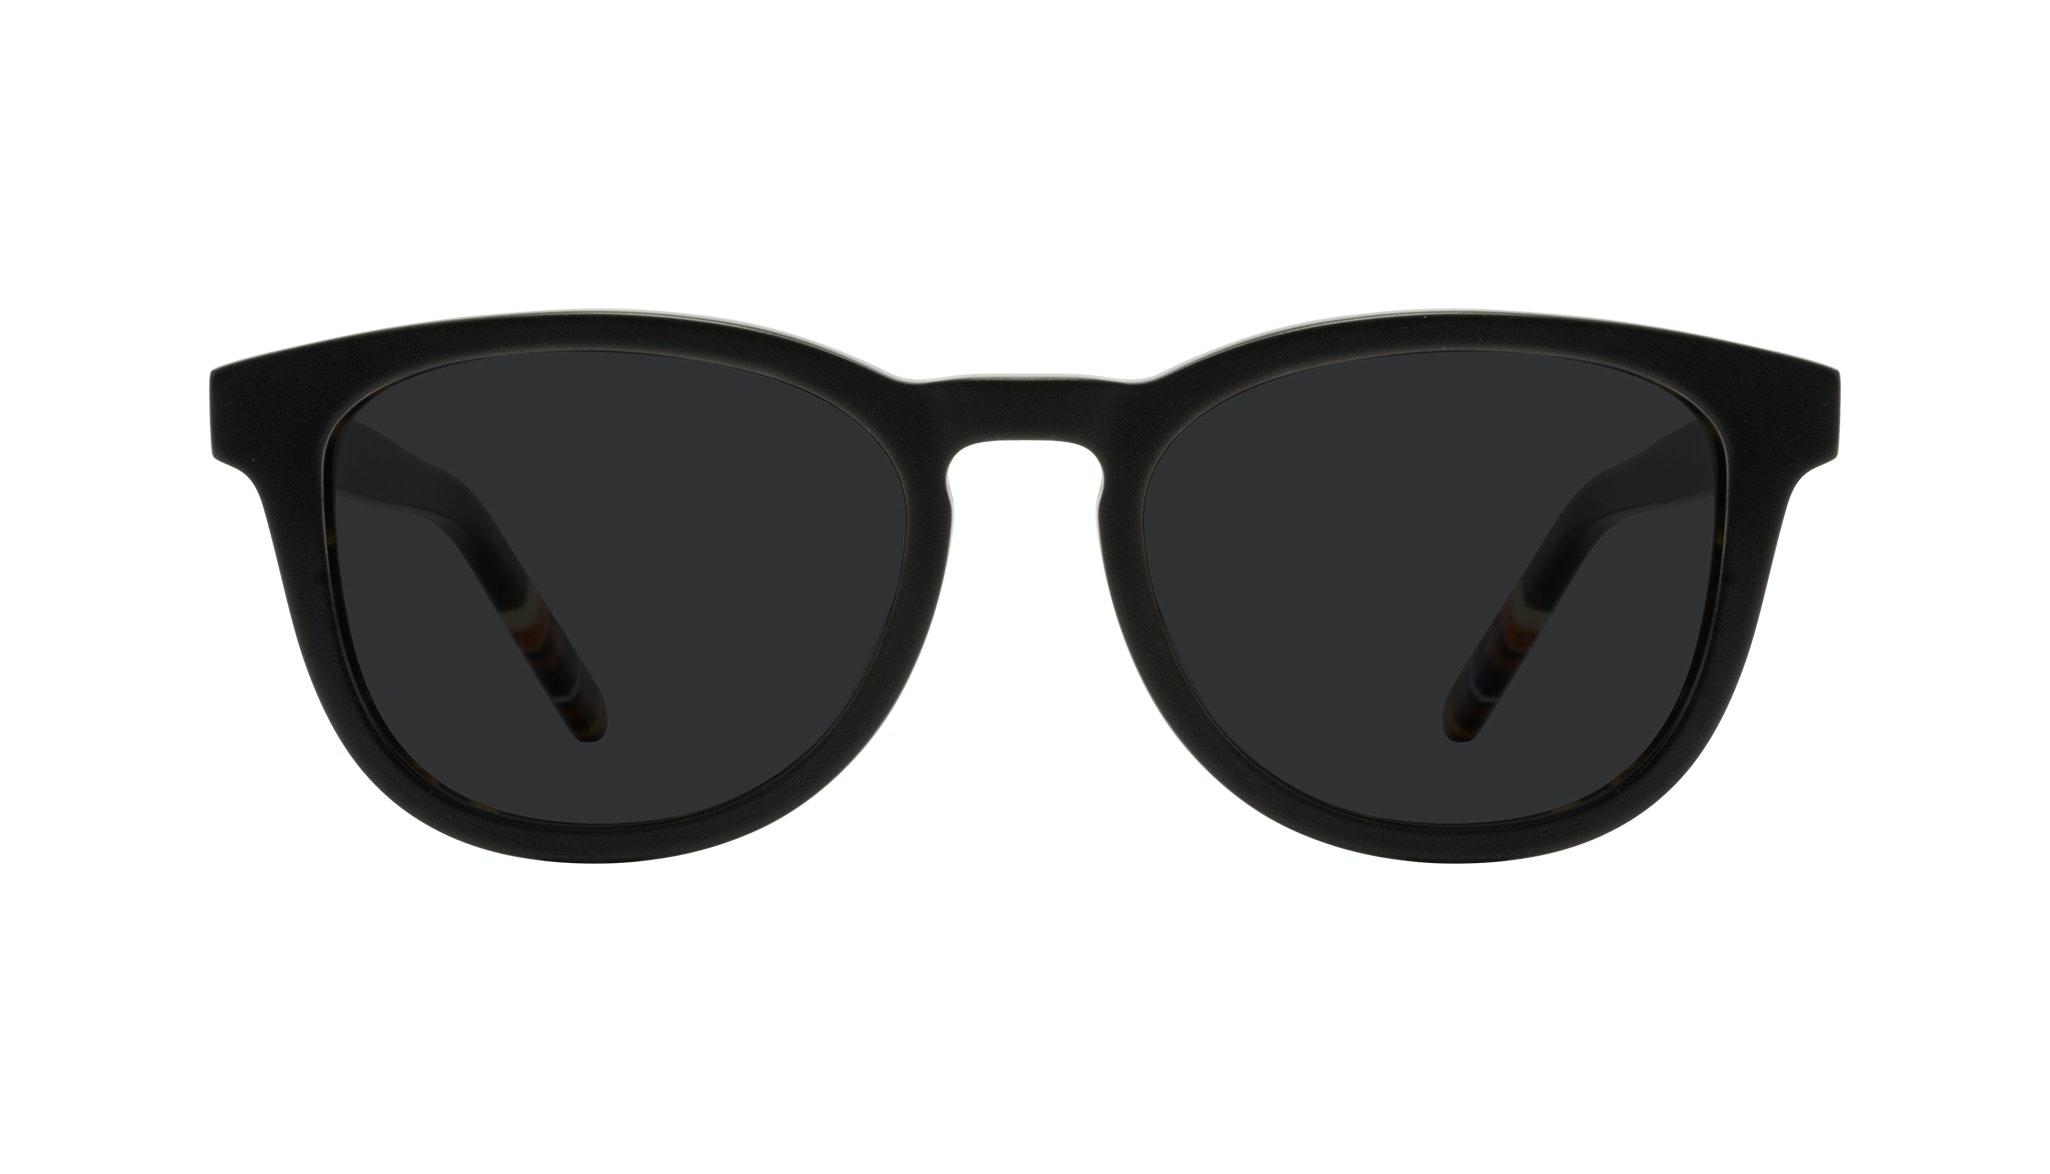 Affordable Fashion Glasses Round Sunglasses Men Goal Black Tort Front